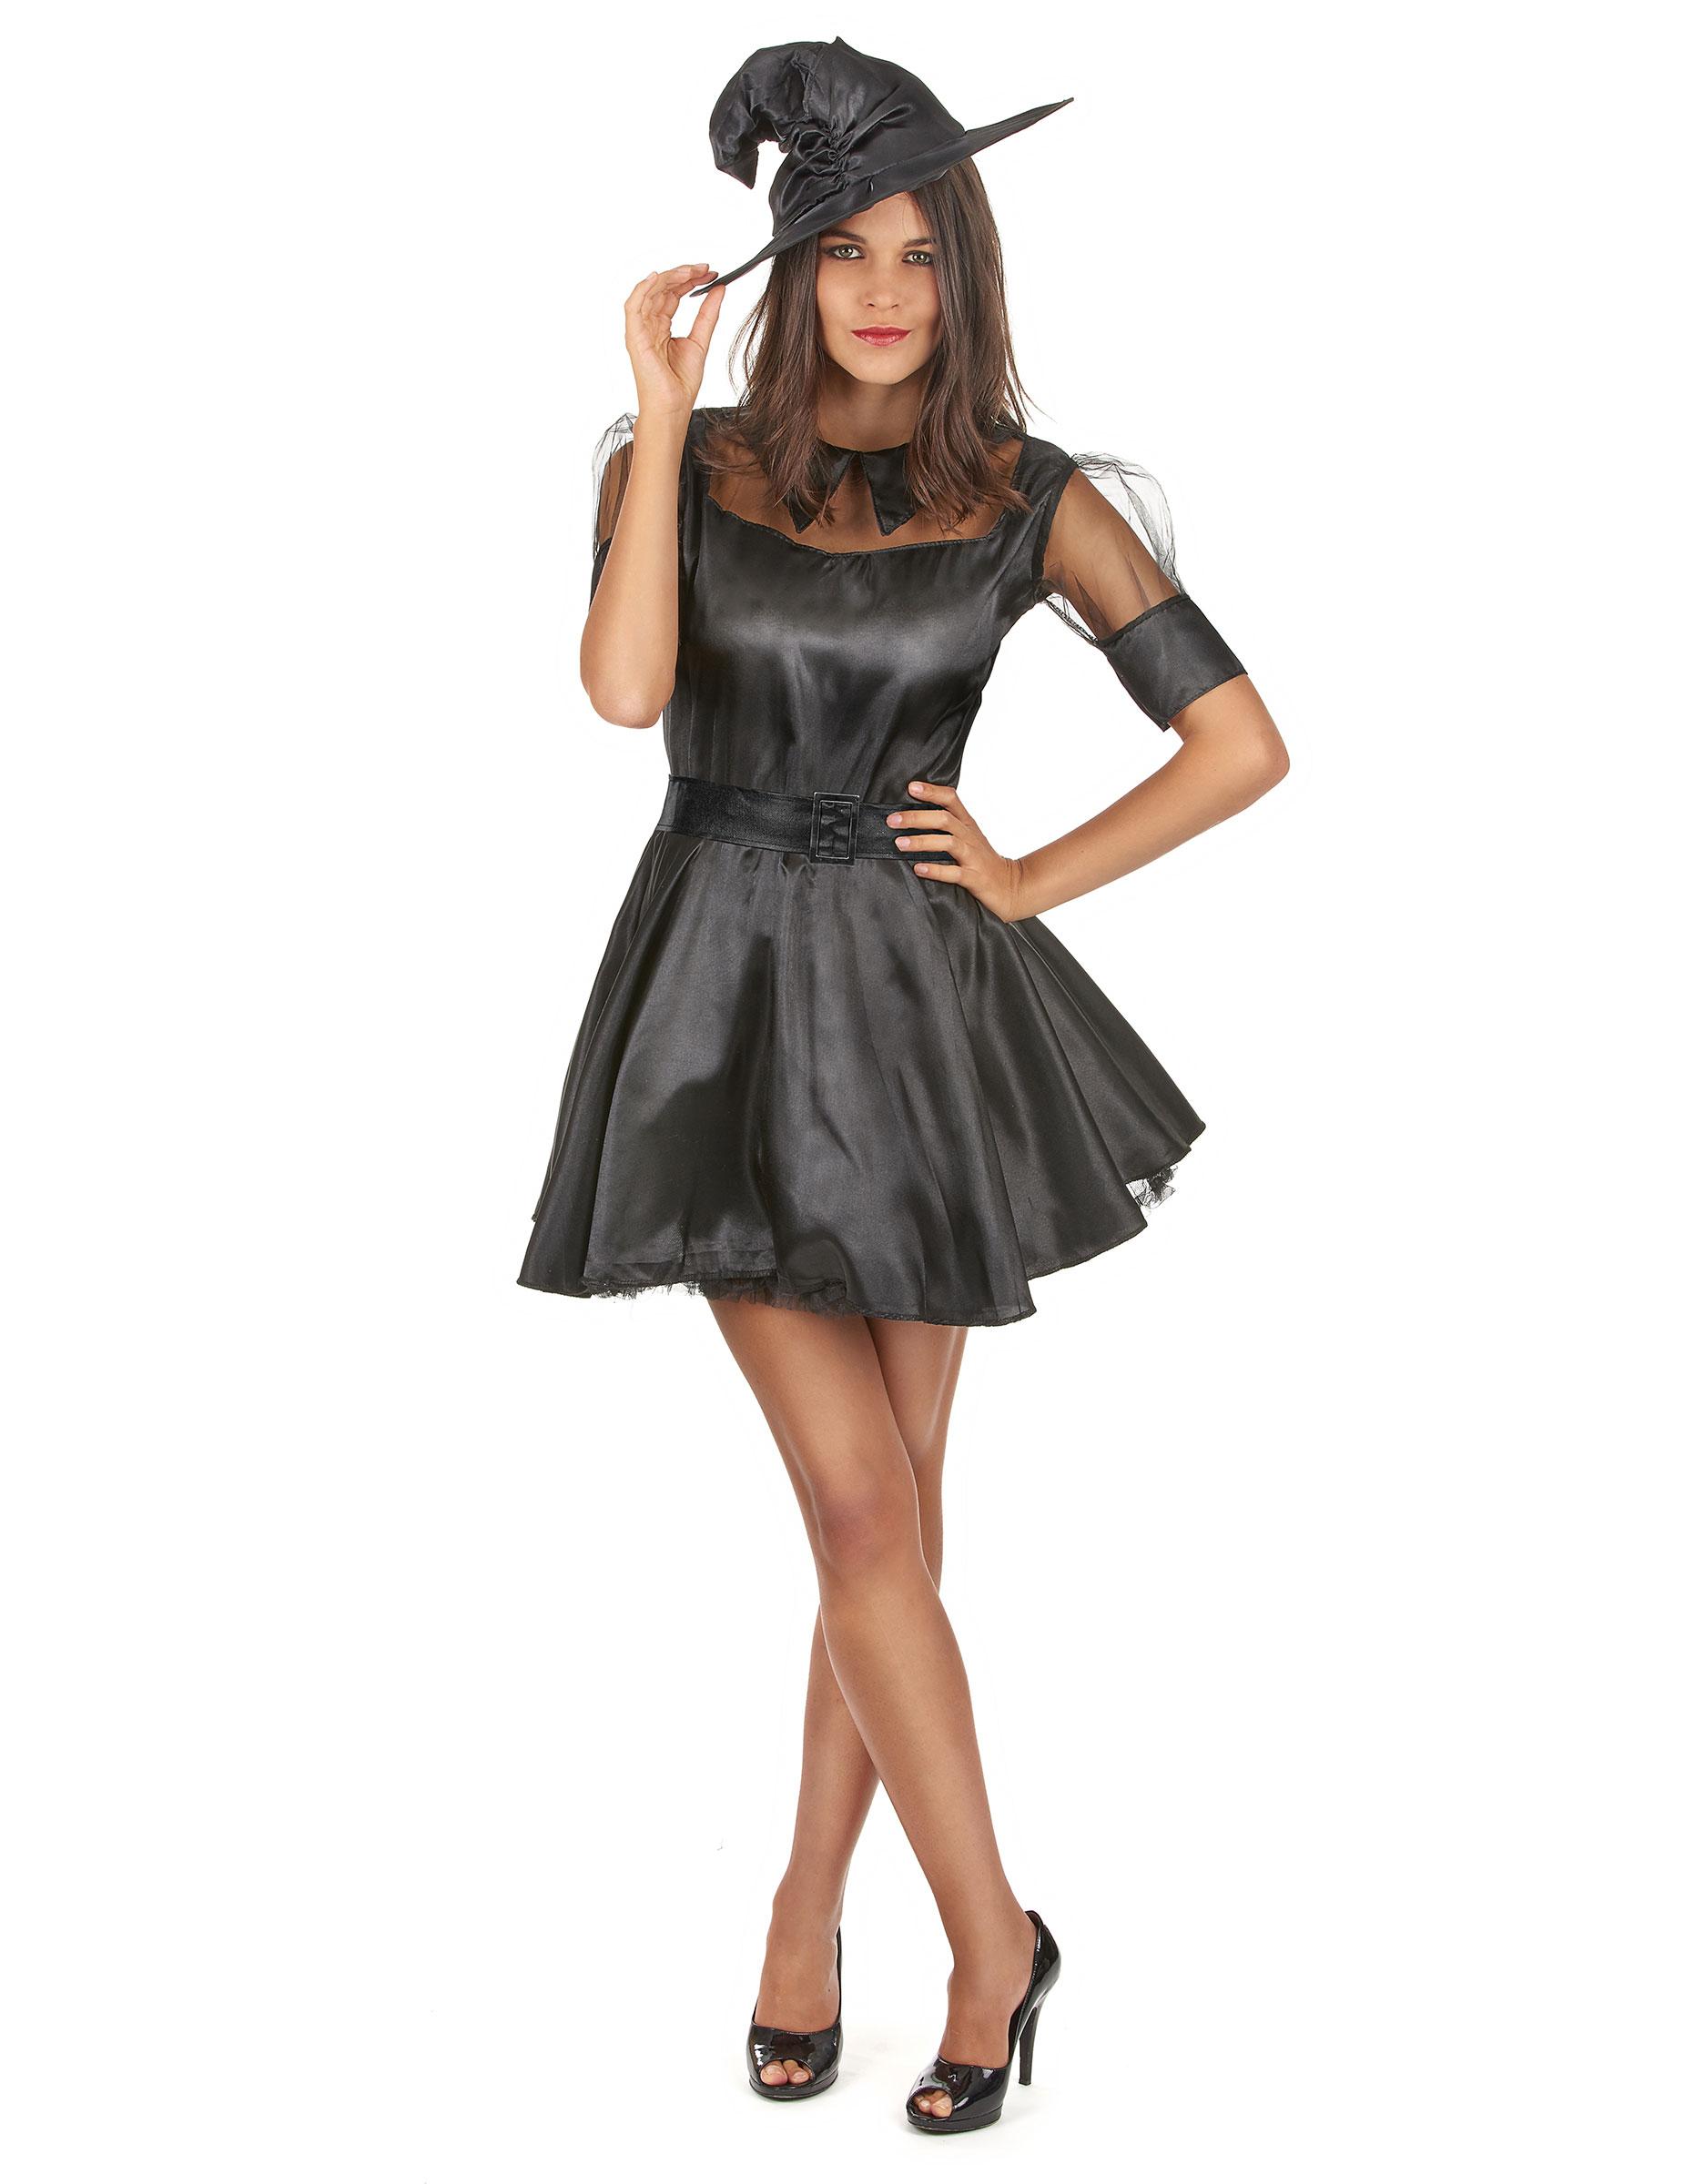 kleines schwarzes halloween kost m f r die modebewusste. Black Bedroom Furniture Sets. Home Design Ideas